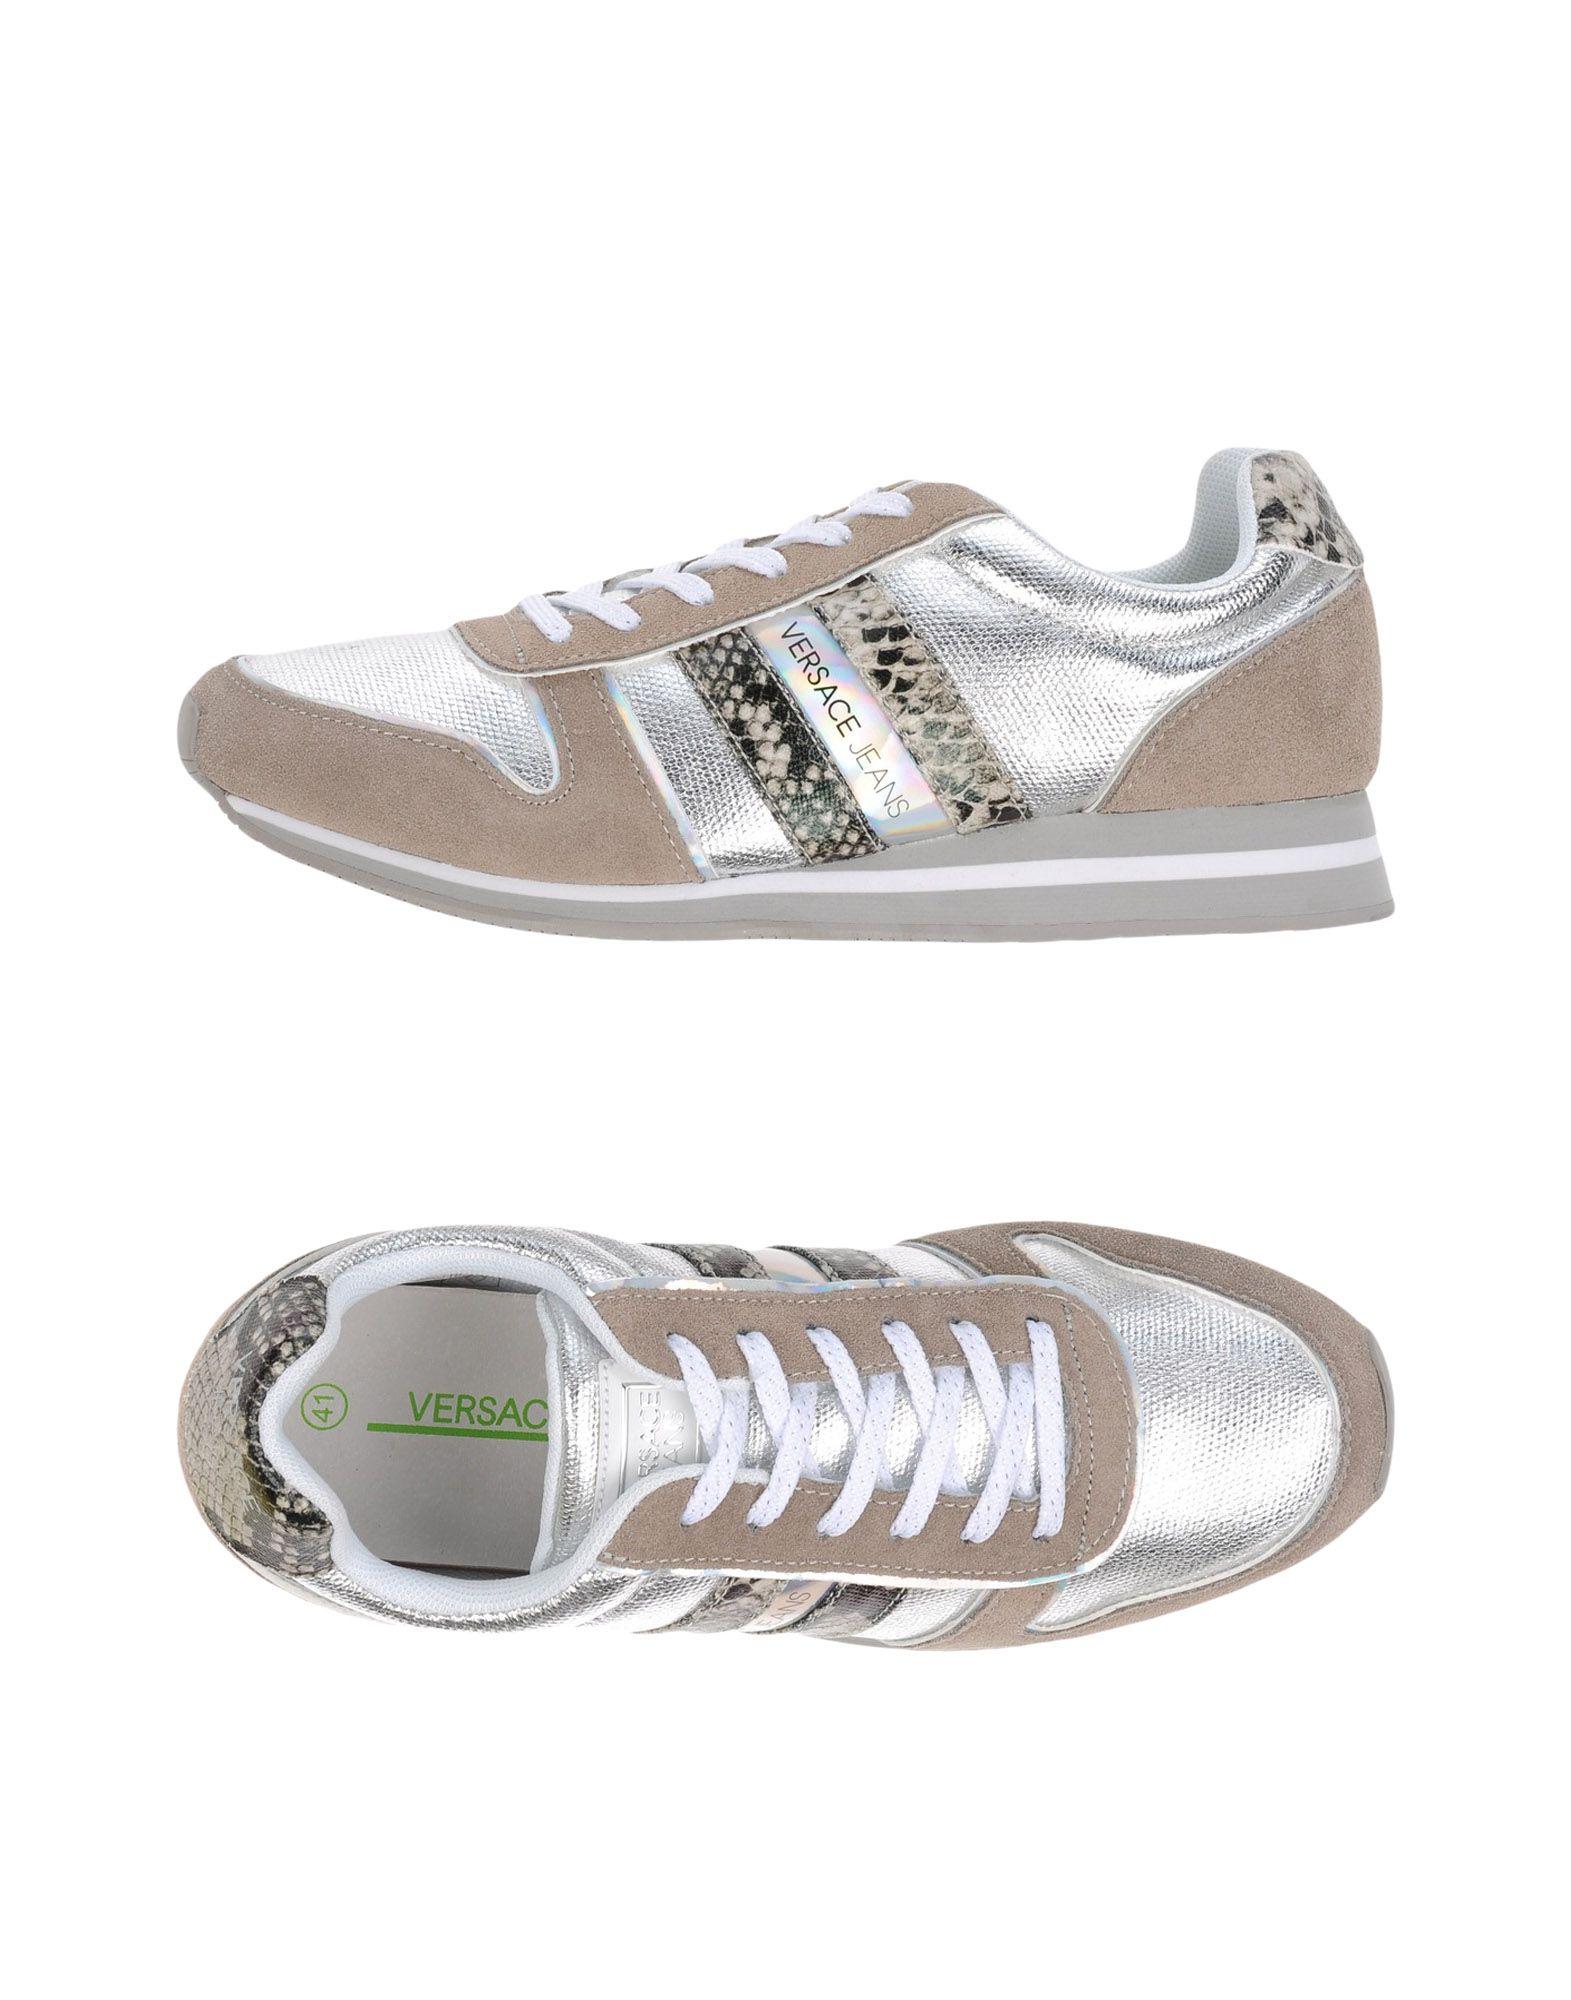 Versace on Jeans Sneakers - Women Versace Jeans Sneakers online on Versace  Canada - 11221700UE c82d81